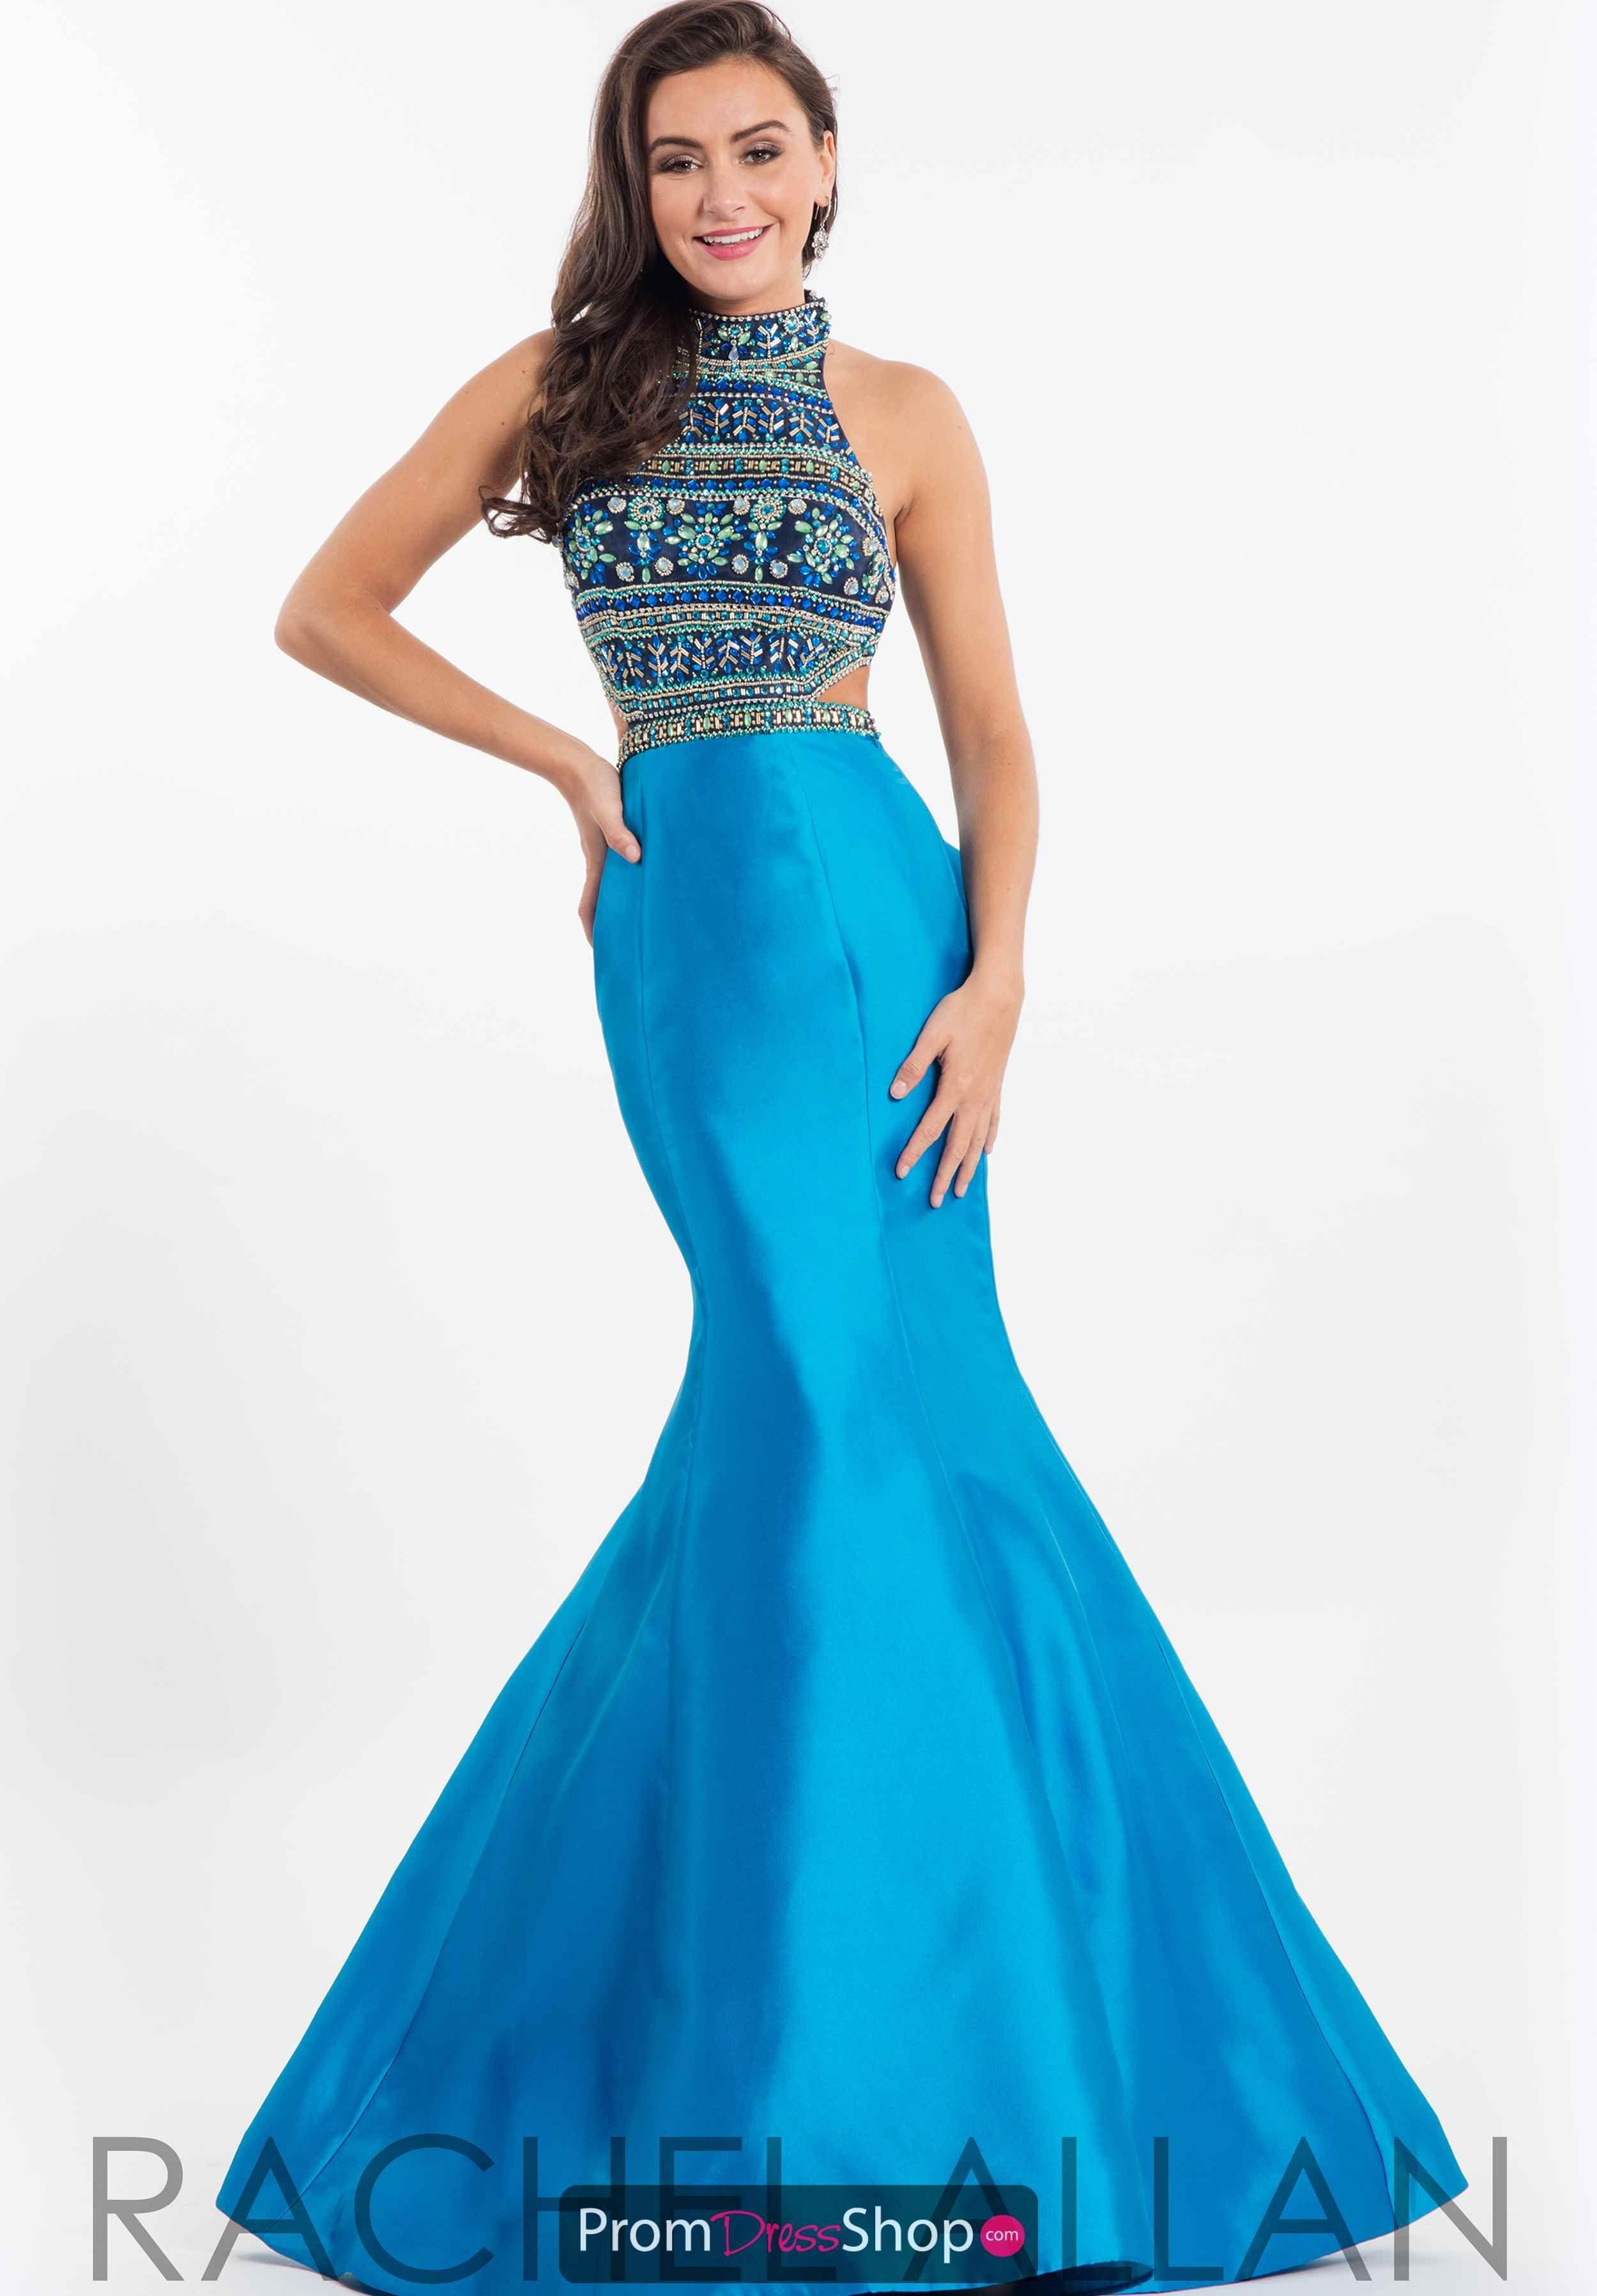 4a5ec37d7b4 Rachel Allan 2017 Pageant Dresses - Data Dynamic AG